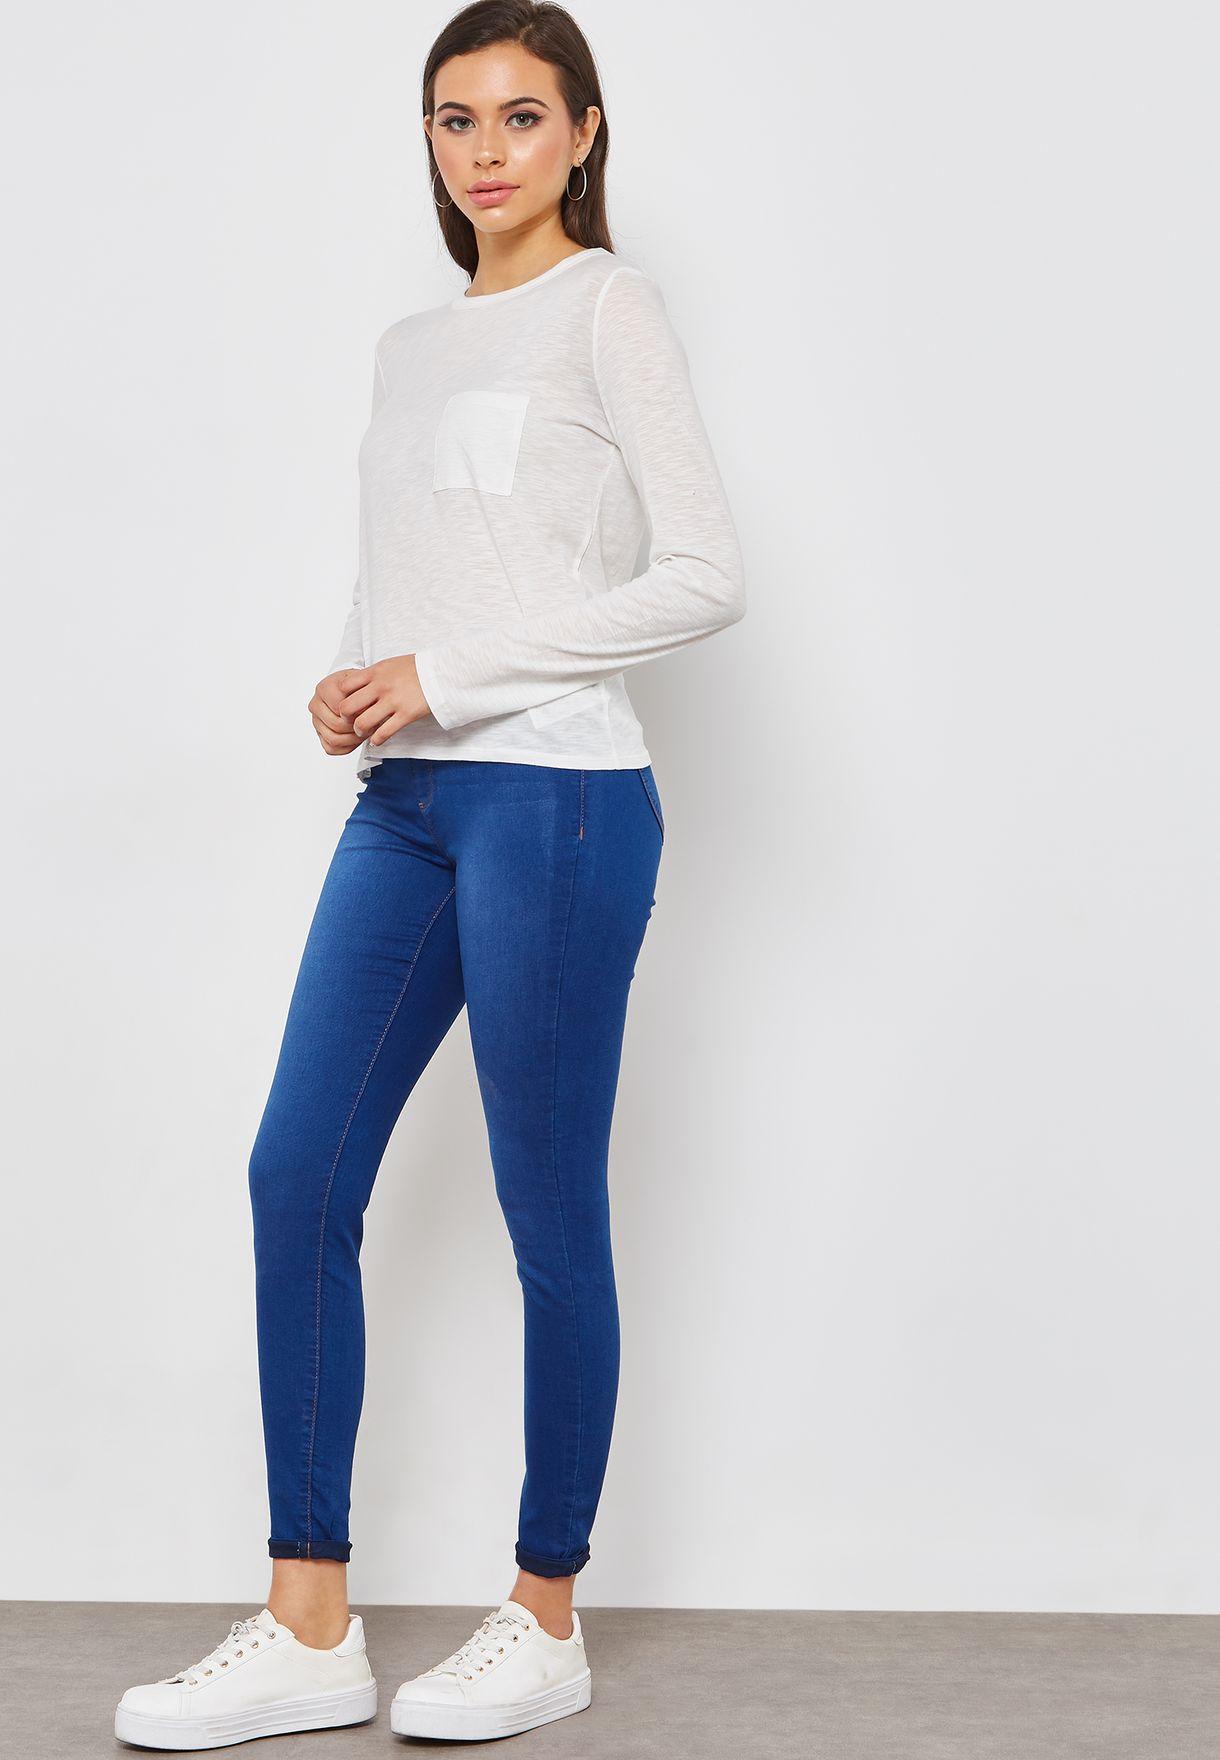 8a6a9763d تسوق بنطال جينز بخصر مطاطي ماركة دوروثي بيركنز لون أزرق 70533919 في ...